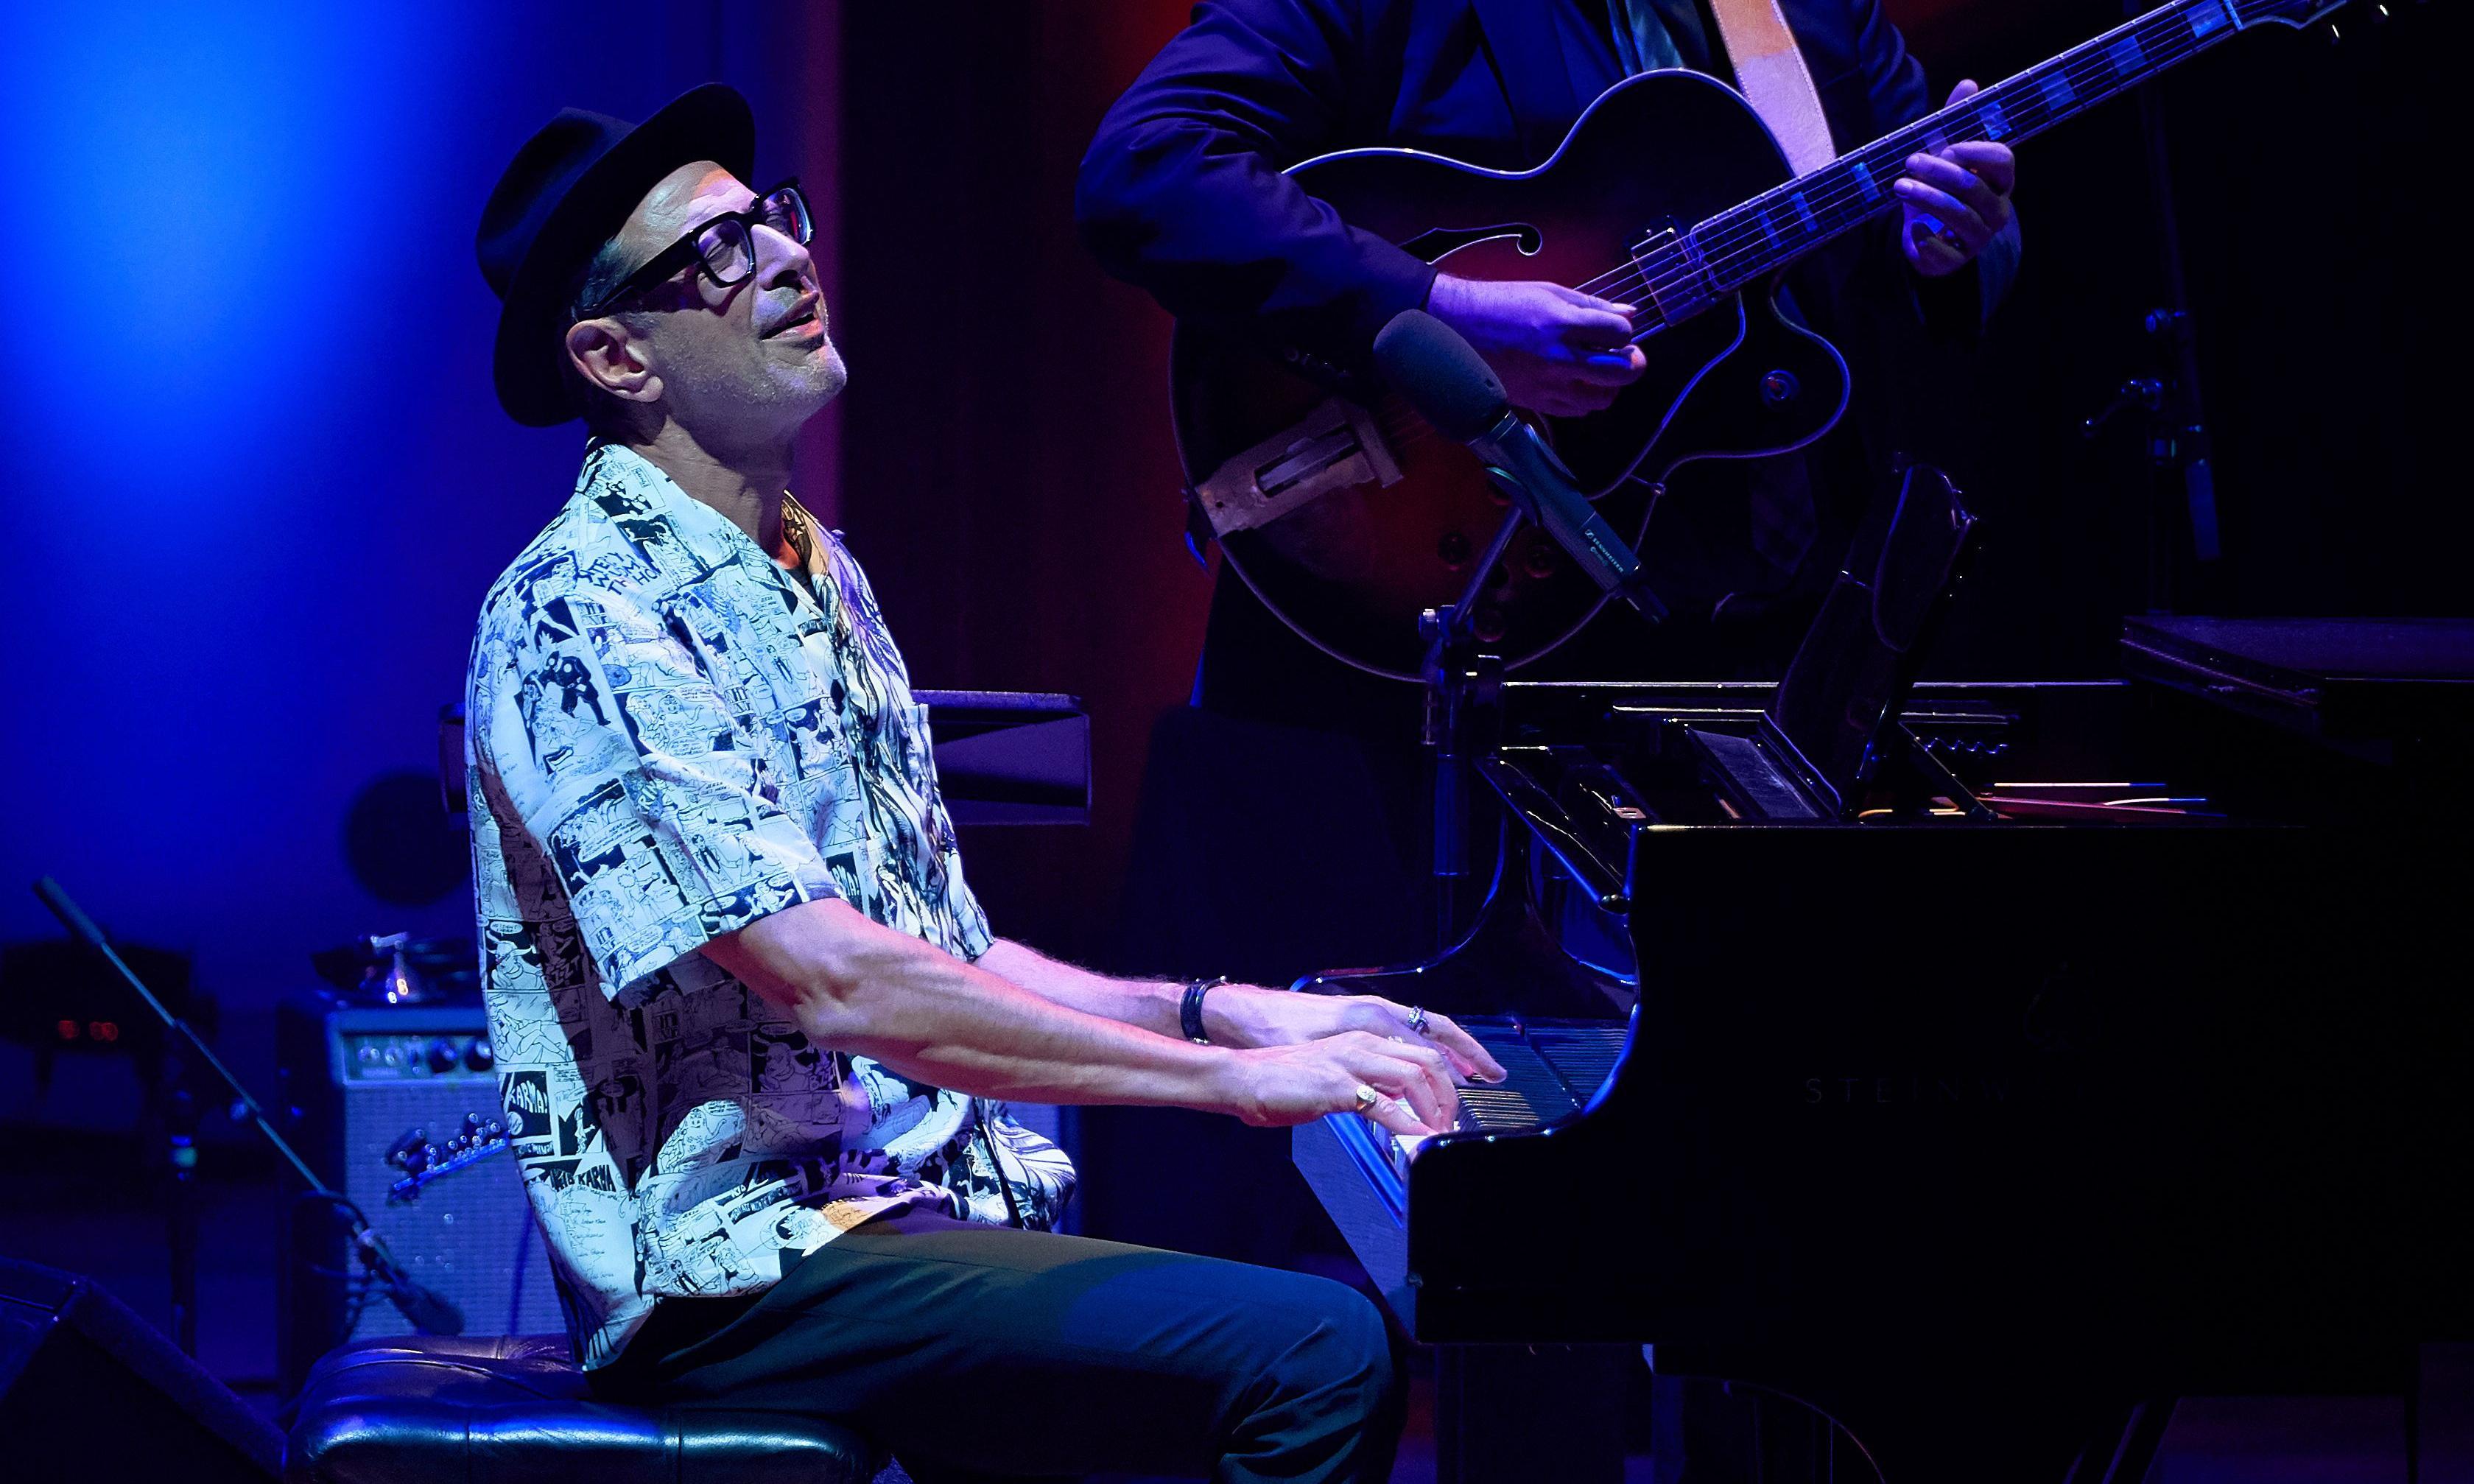 Jeff Goldblum review – showmanship and musicianship joyously combined